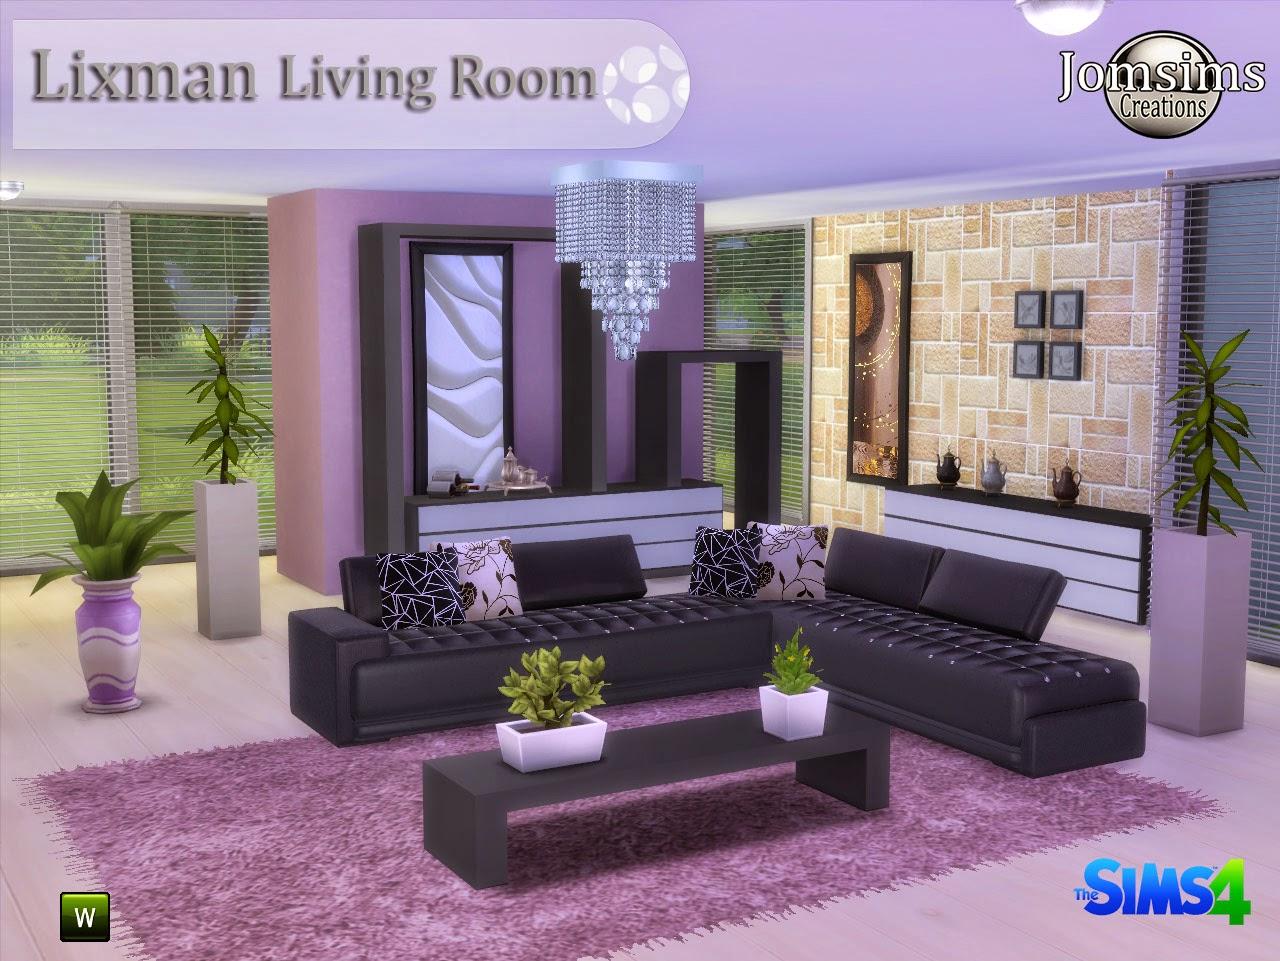 Jomsimscreations blog new living room sims 4 lixman for Living room sims 4